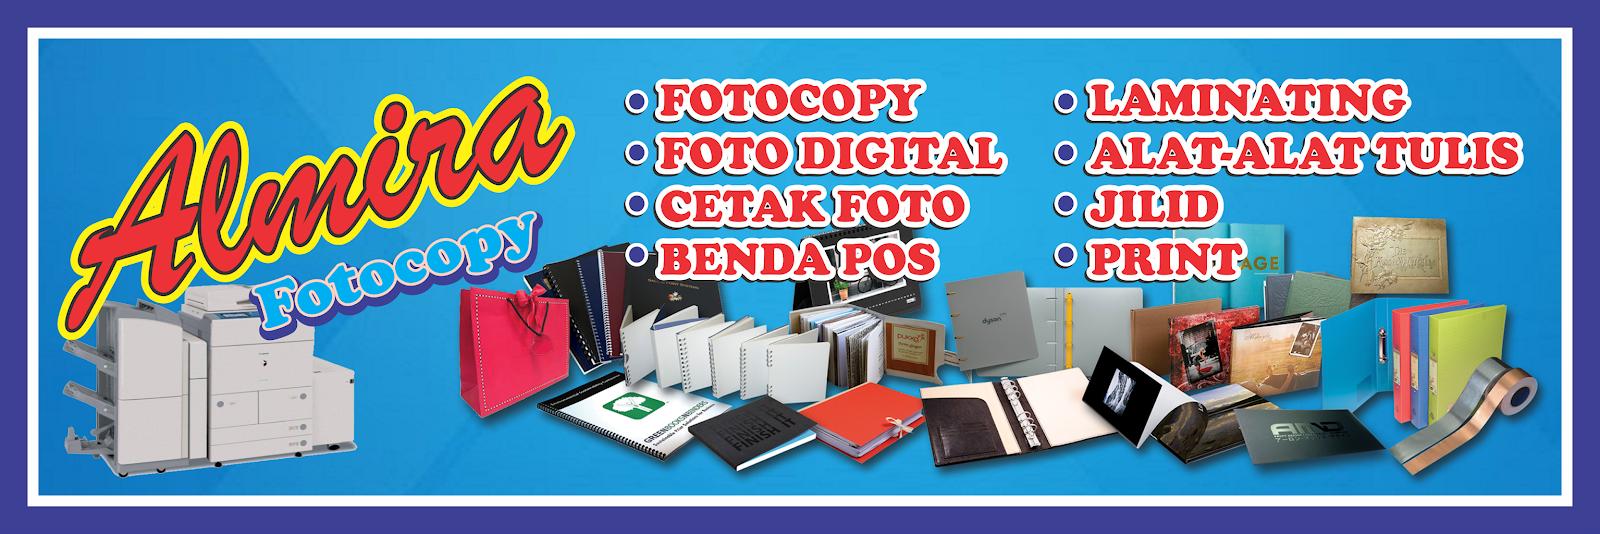 Ide 30+ Spanduk Fotocopy